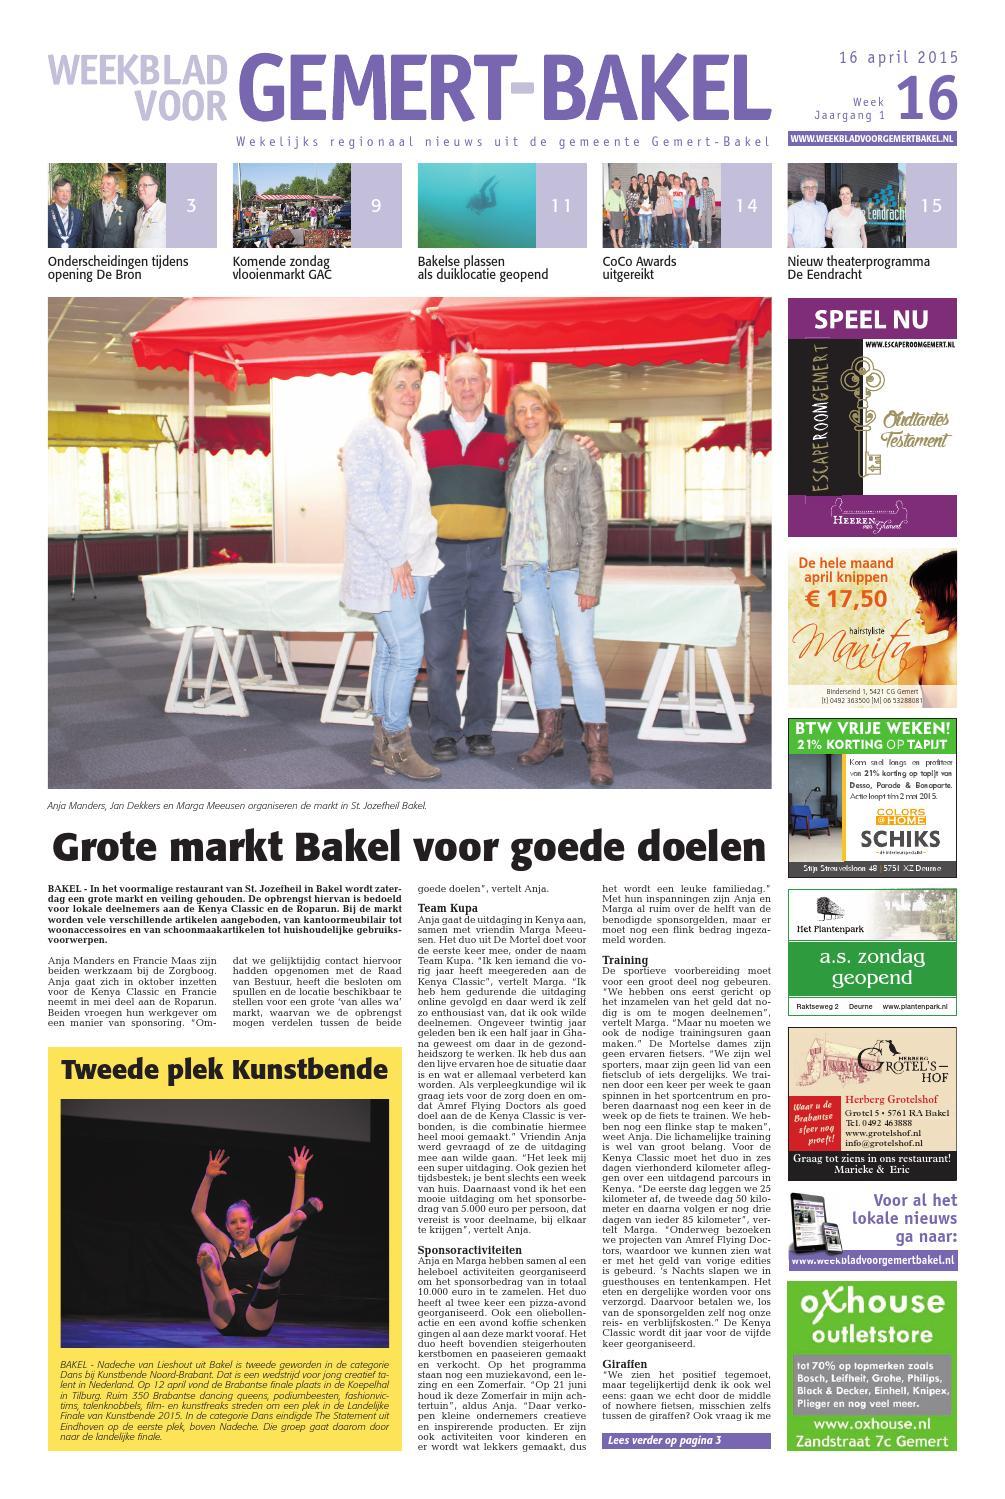 6a5978460db Weekblad voor gemert bakel wk16 by Das Publishers! - issuu